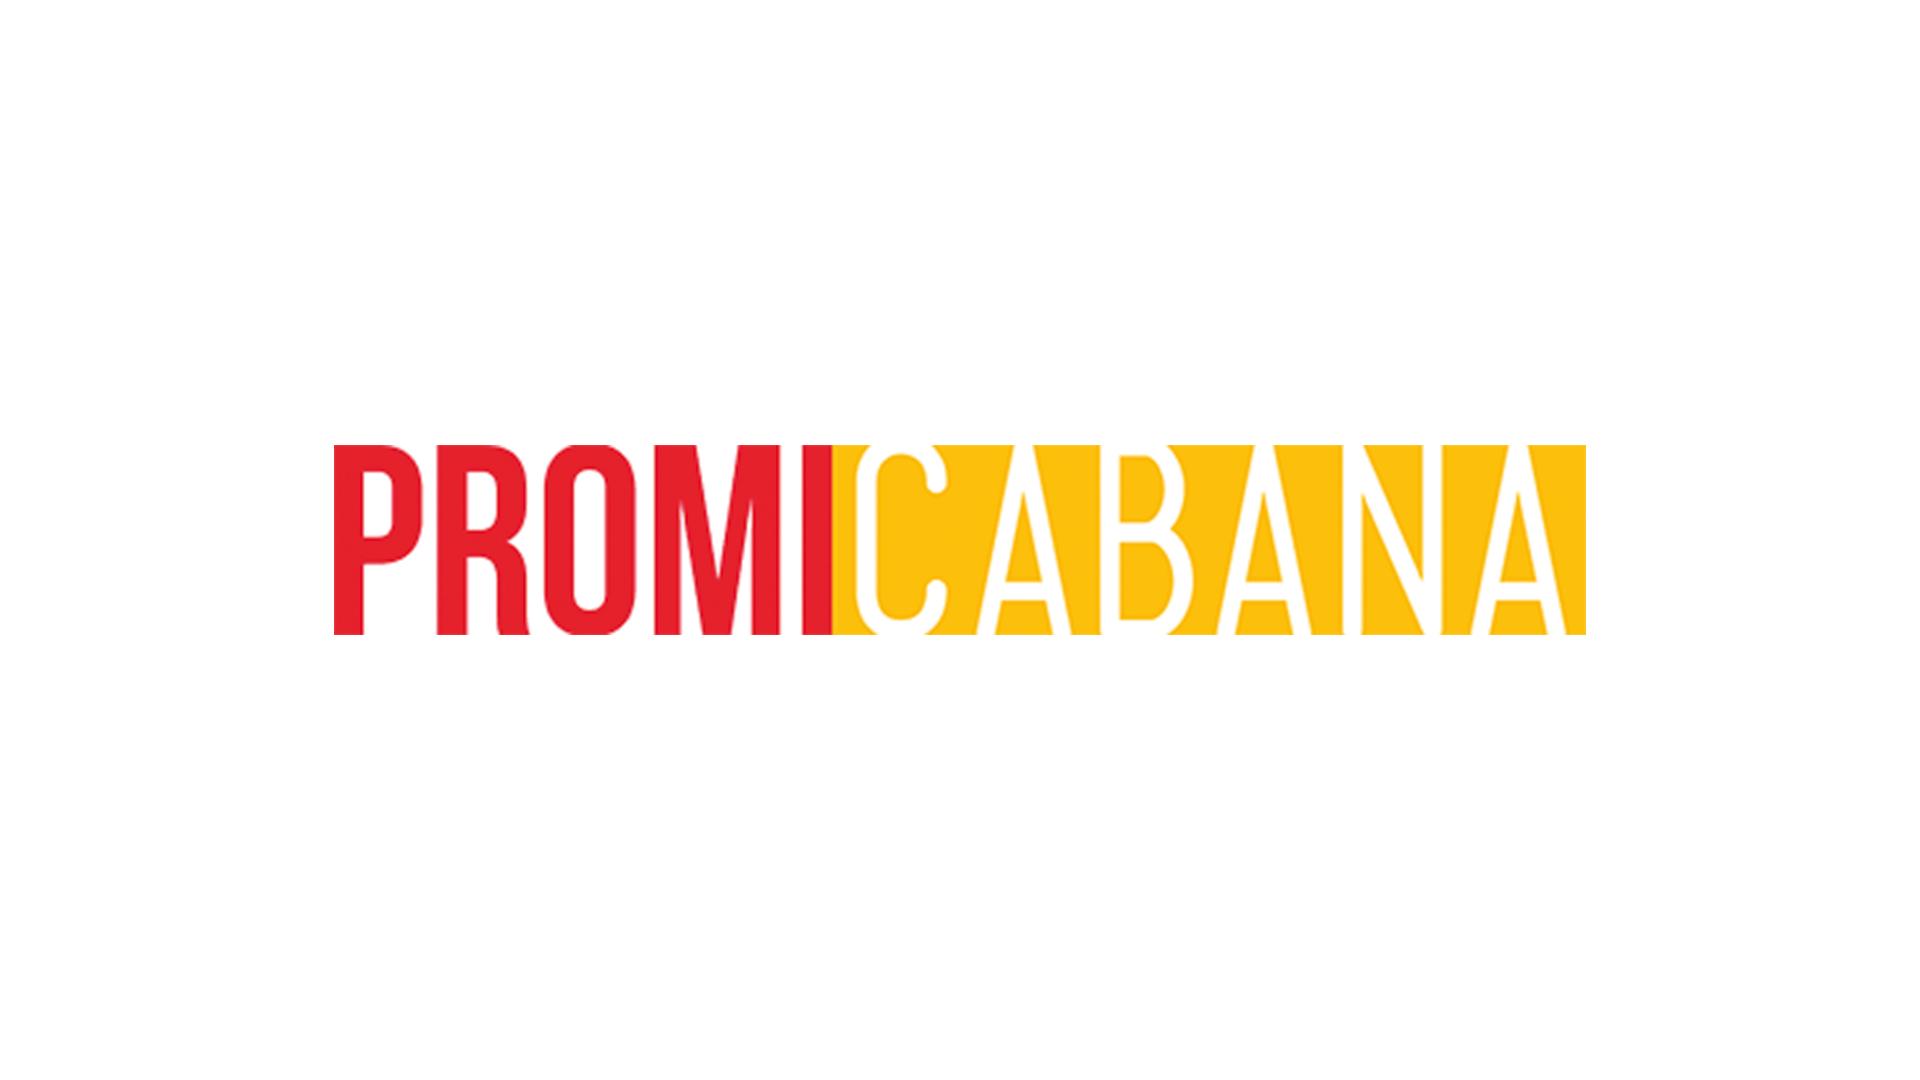 Lauren-Jauregui-All-Night-Musikvideo